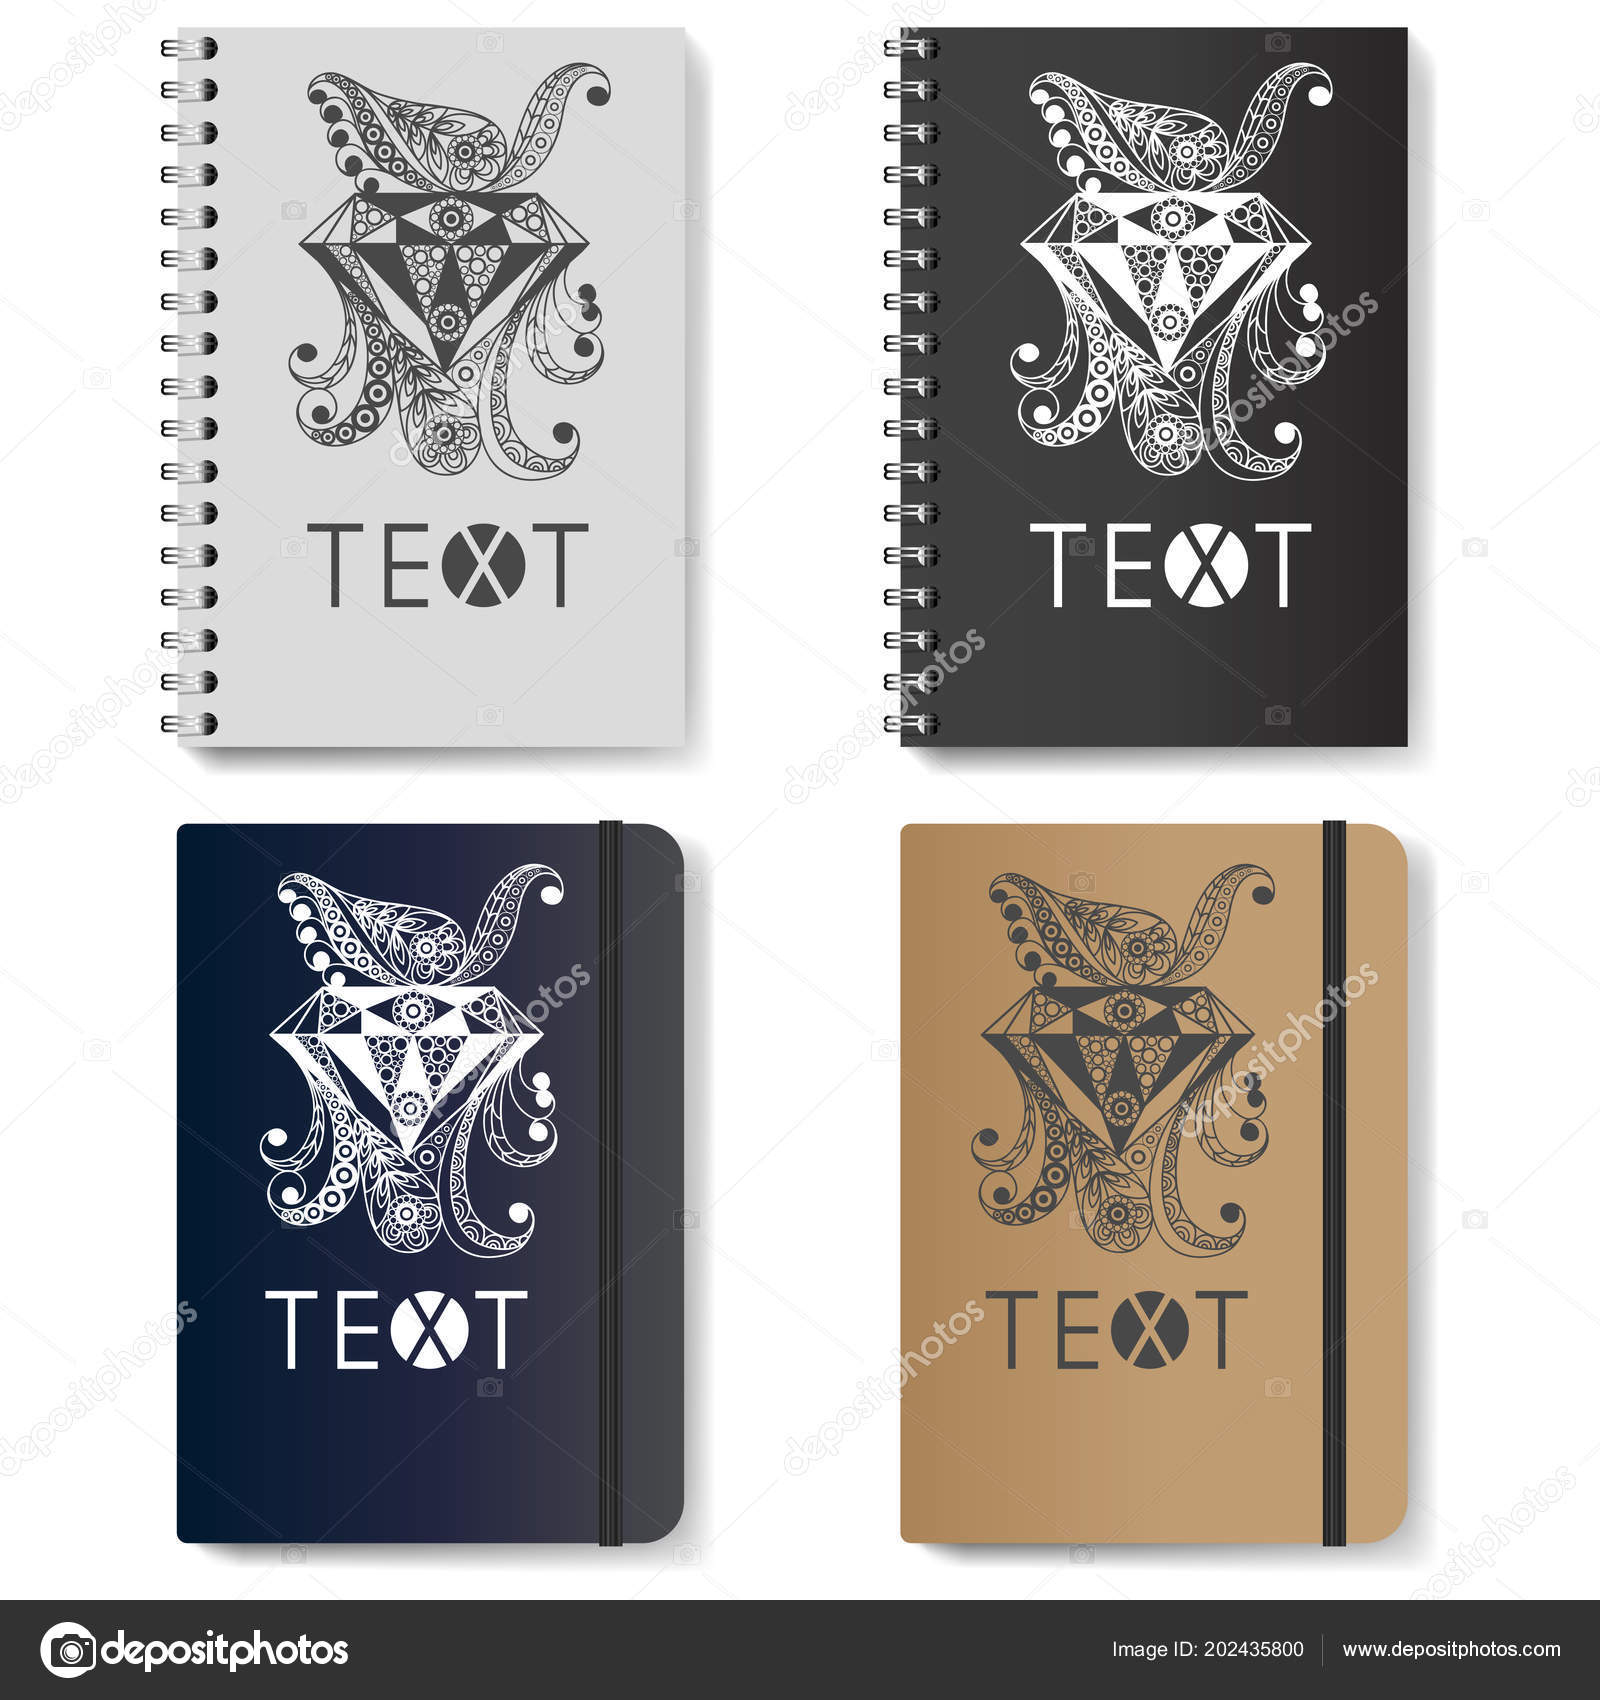 Graphic Abstract Diaries Occult Symbol Masonic Freemasonic